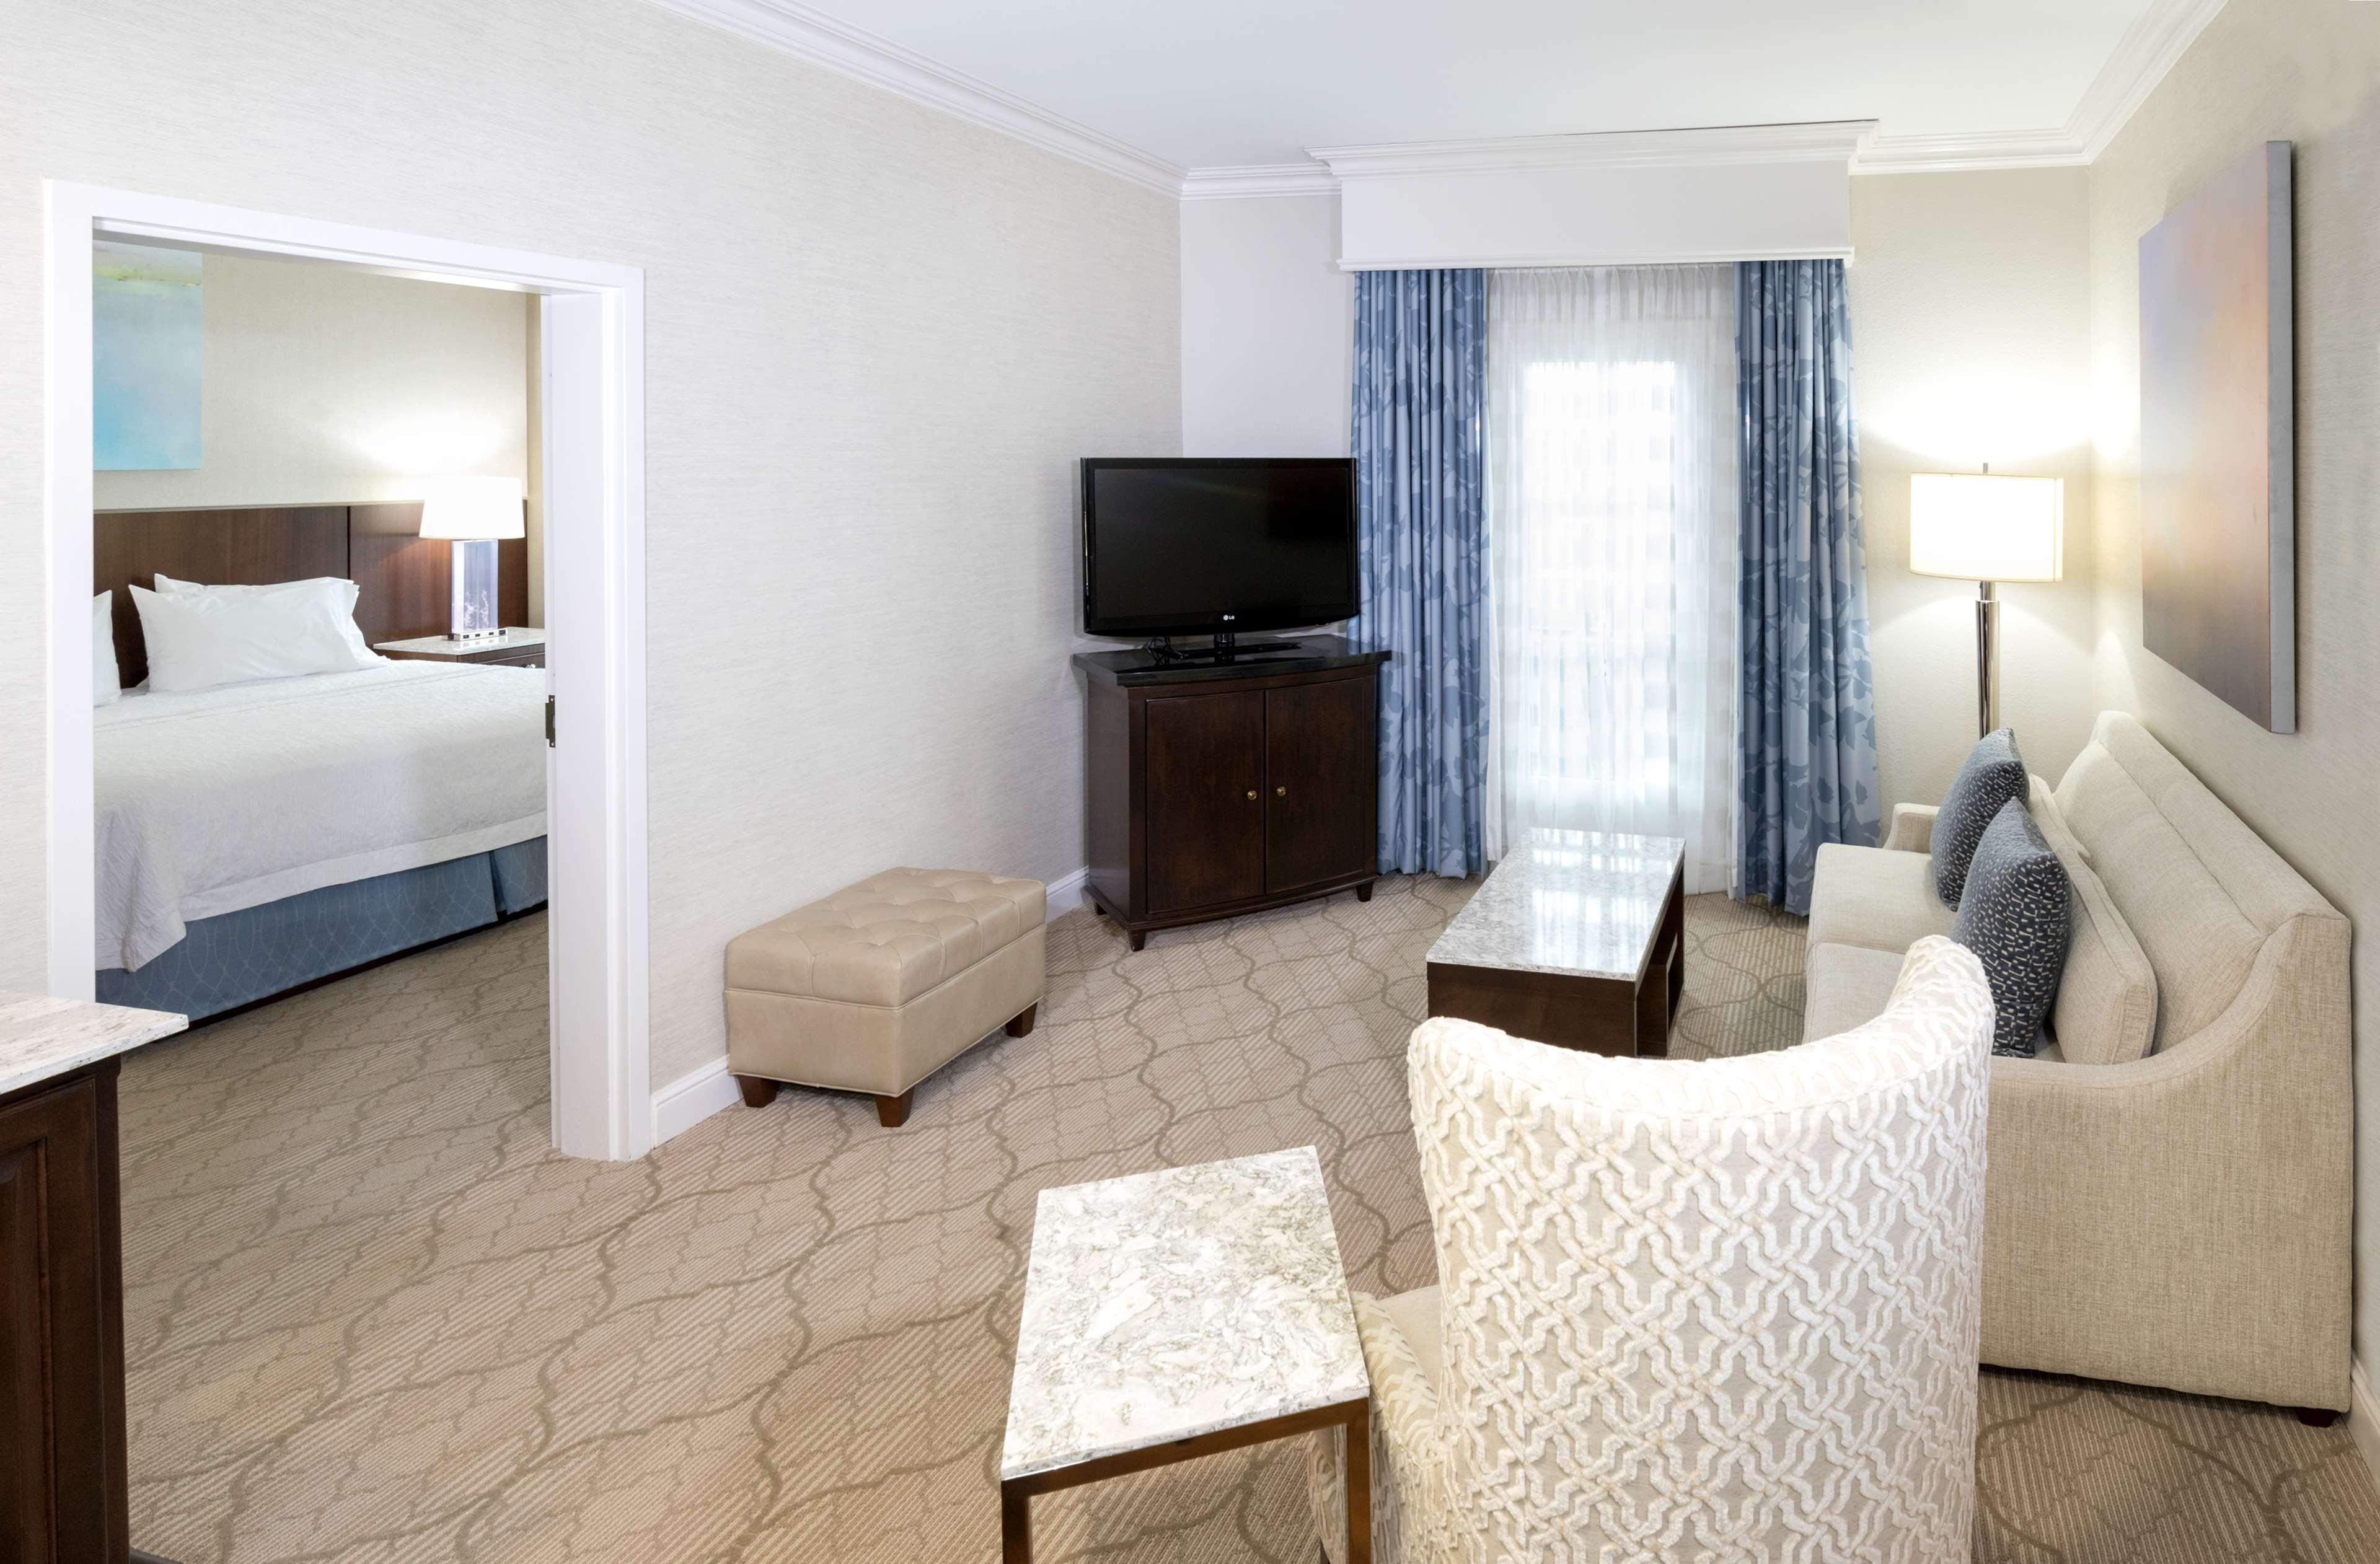 Hampton Inn & Suites Charlotte/South Park at Phillips Place image 47